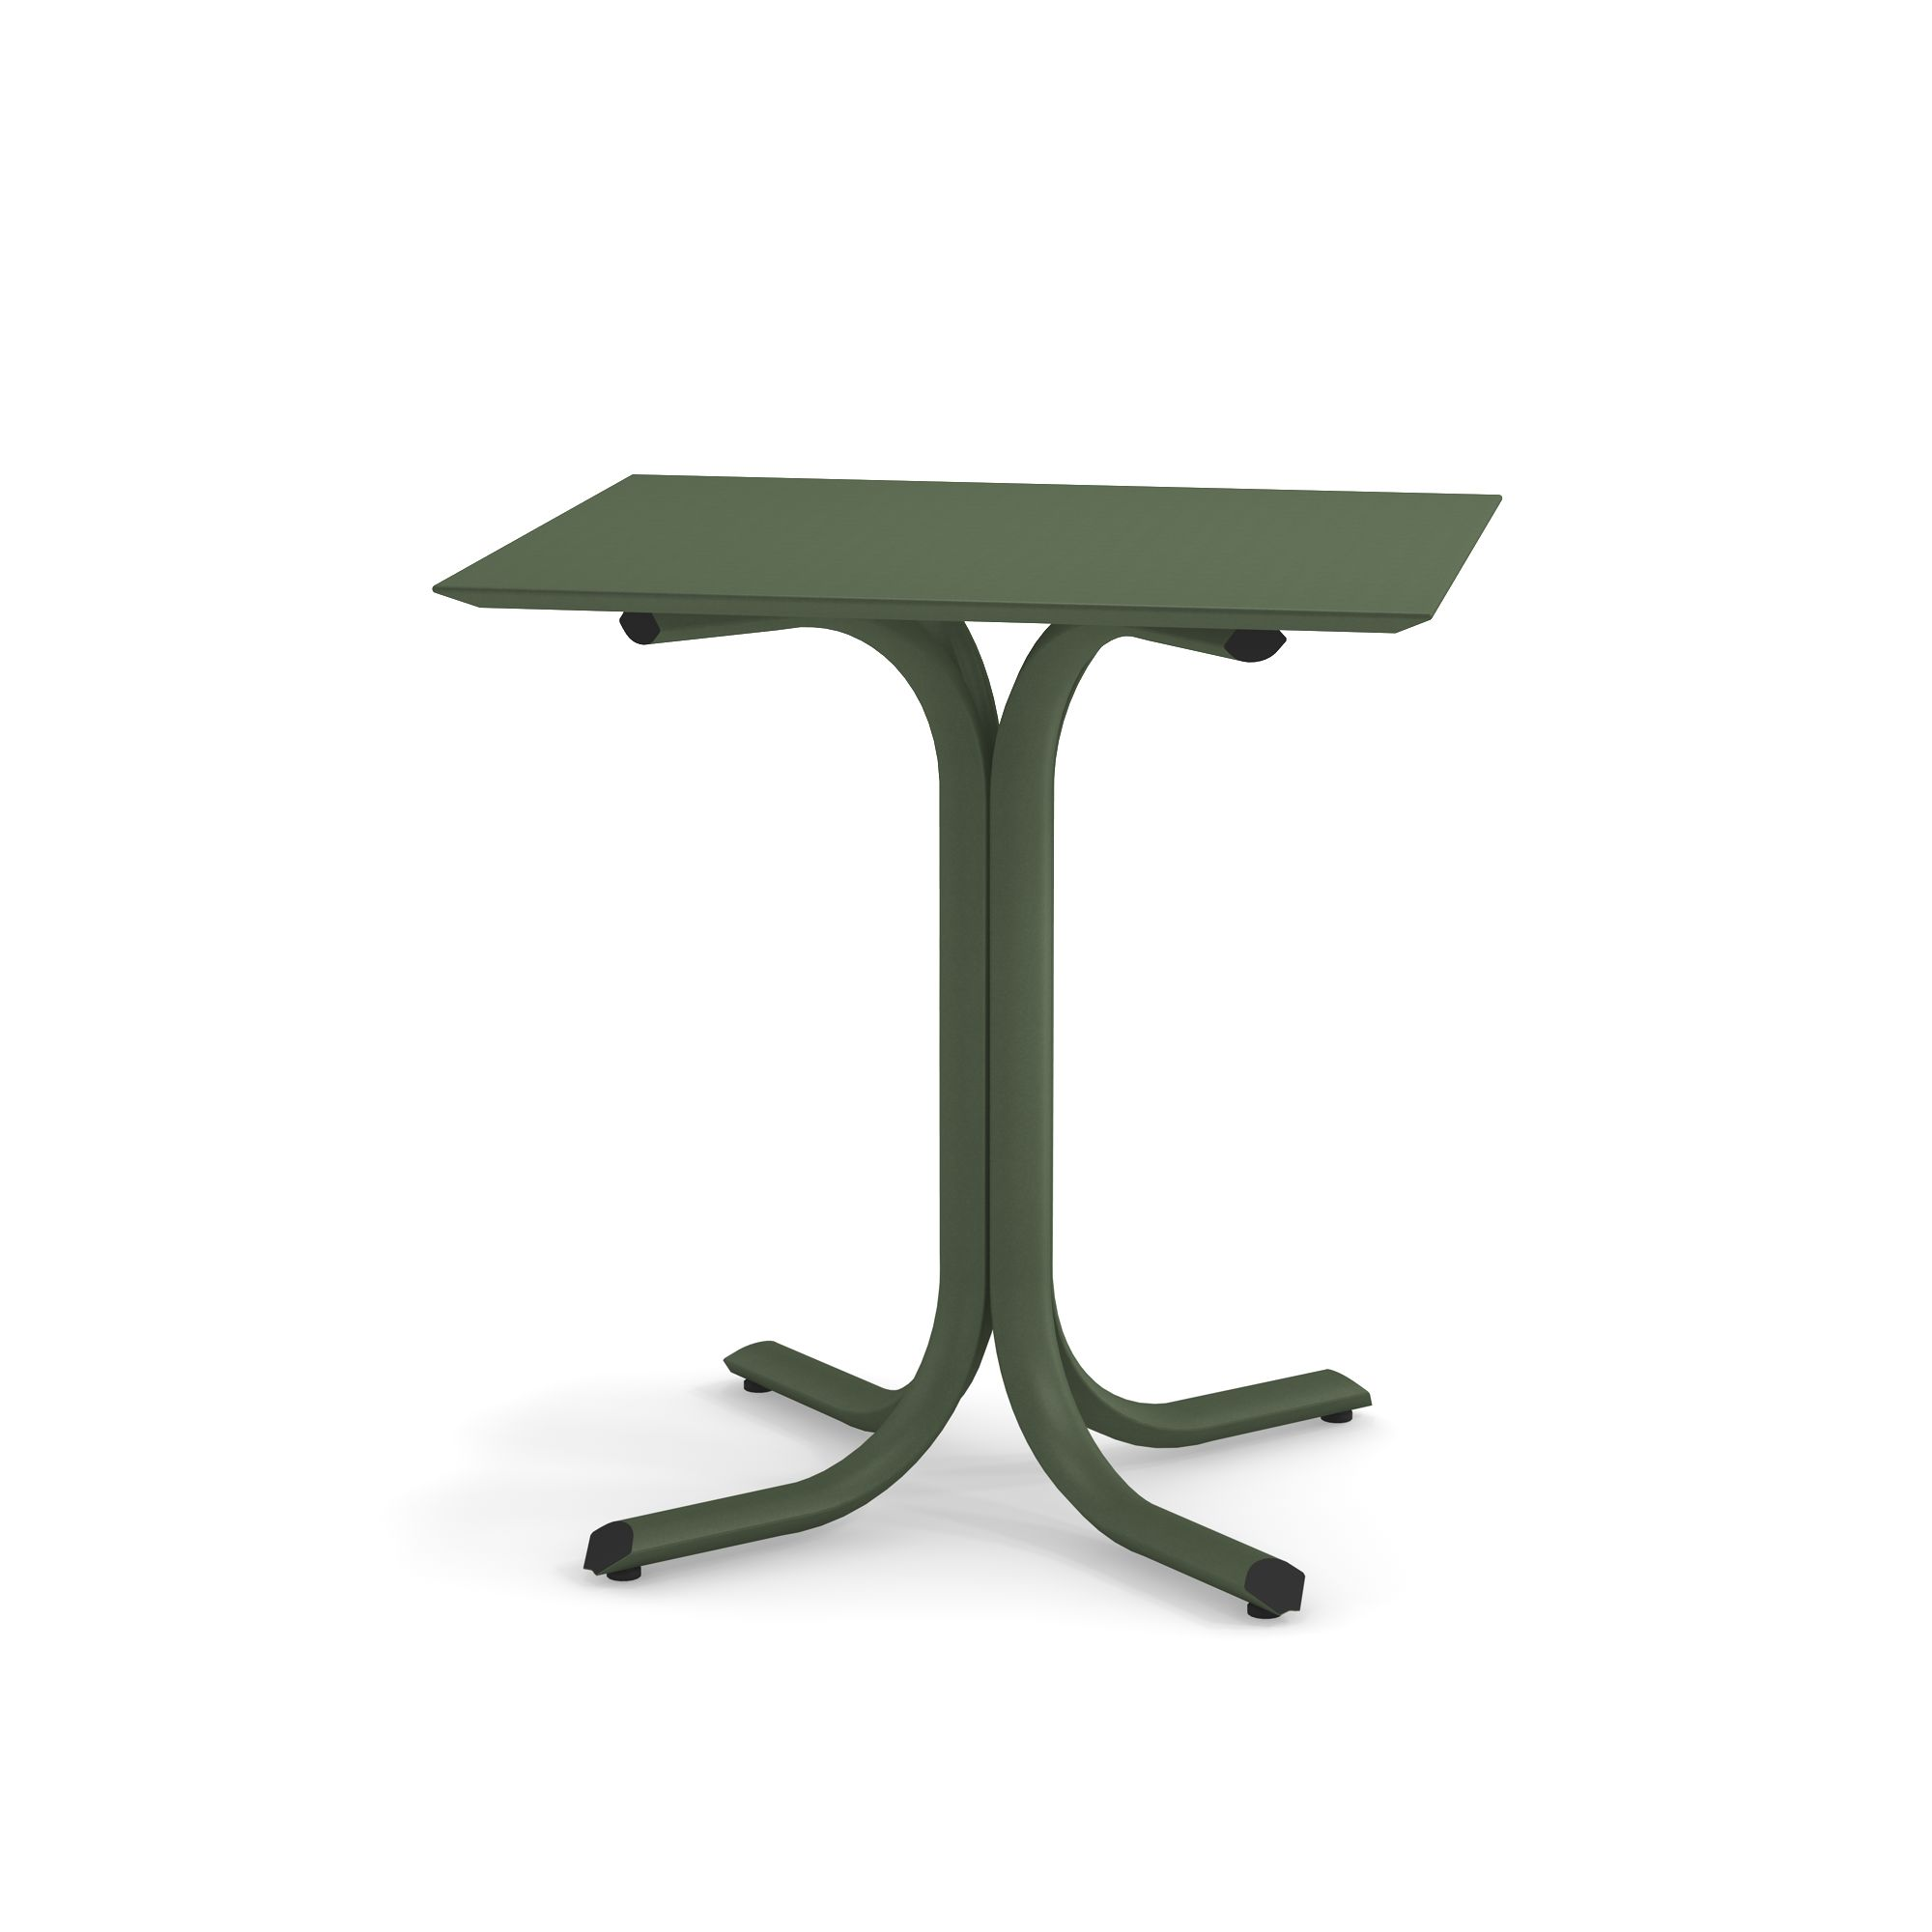 Tavolo Bordo Basso 70X60 da giardino / esterno in acciaio ...